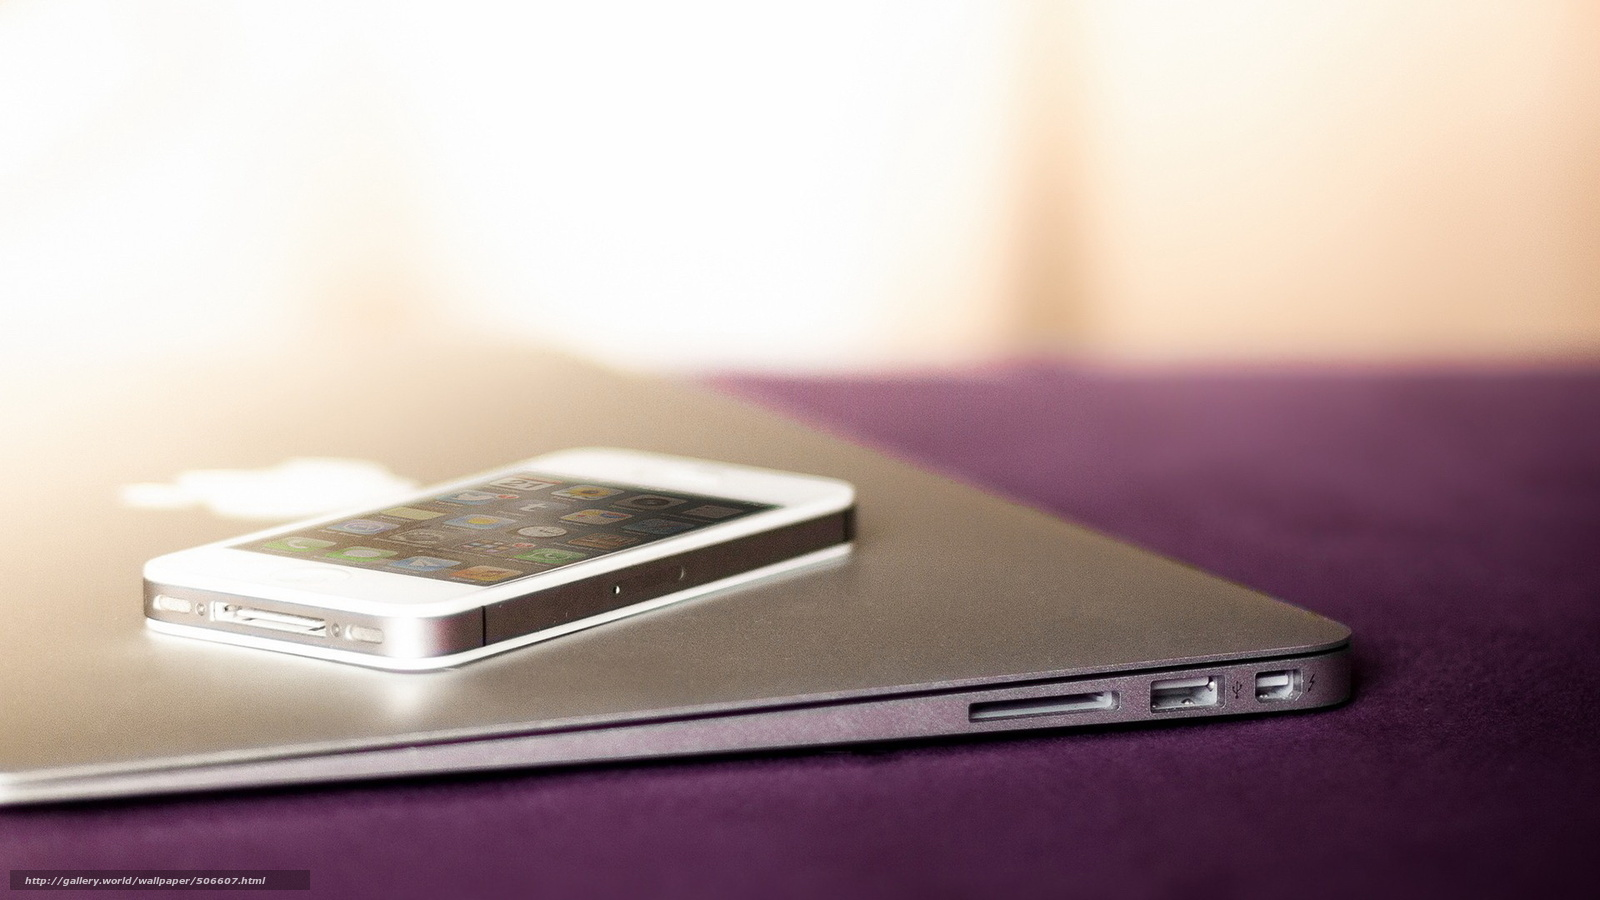 Descargar Gratis Iphone 5 Macbook Iphone Macbook Fondos border=